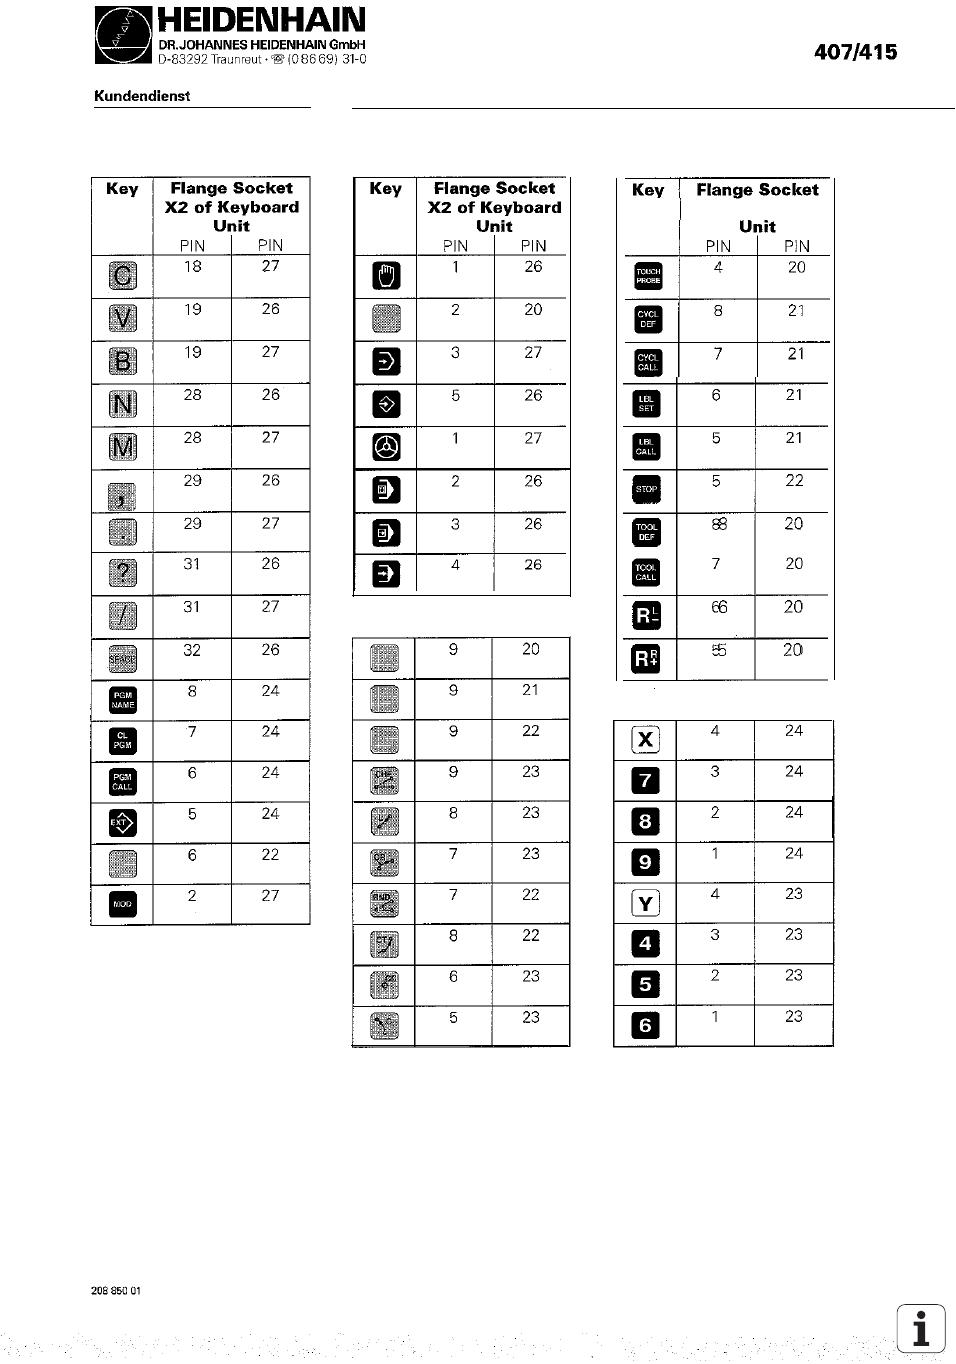 HEIDENHAIN TNC 407 (243 020) Service Manual User Manual